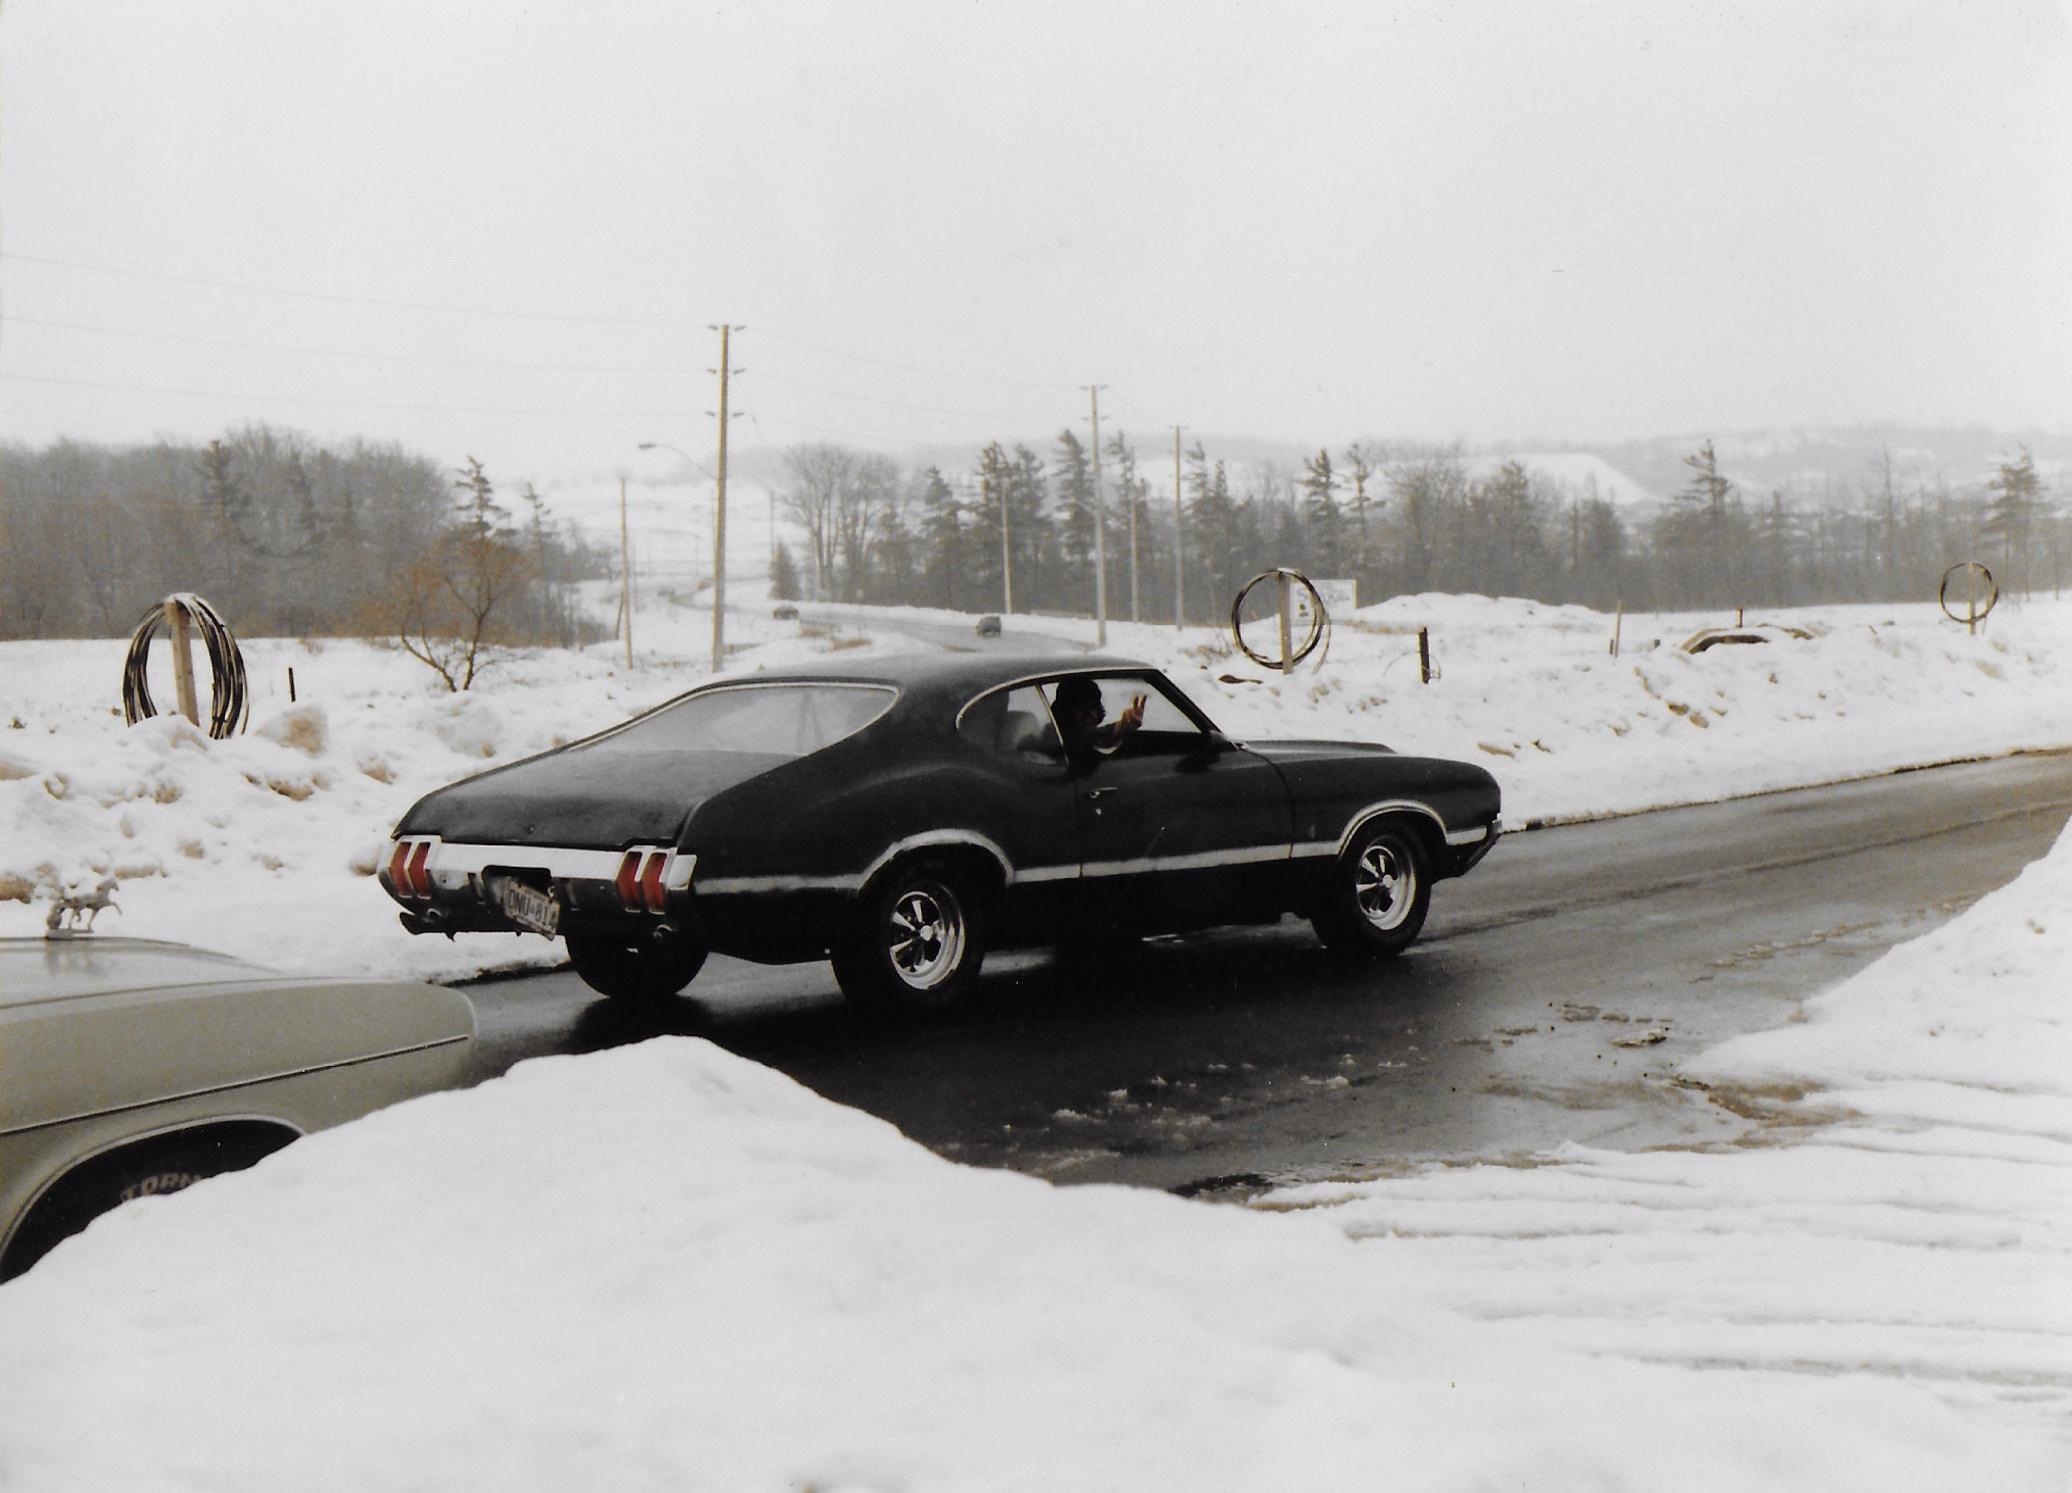 Figure 2  Pre-restoration photograph of the original Oldsmobile 442 W30.